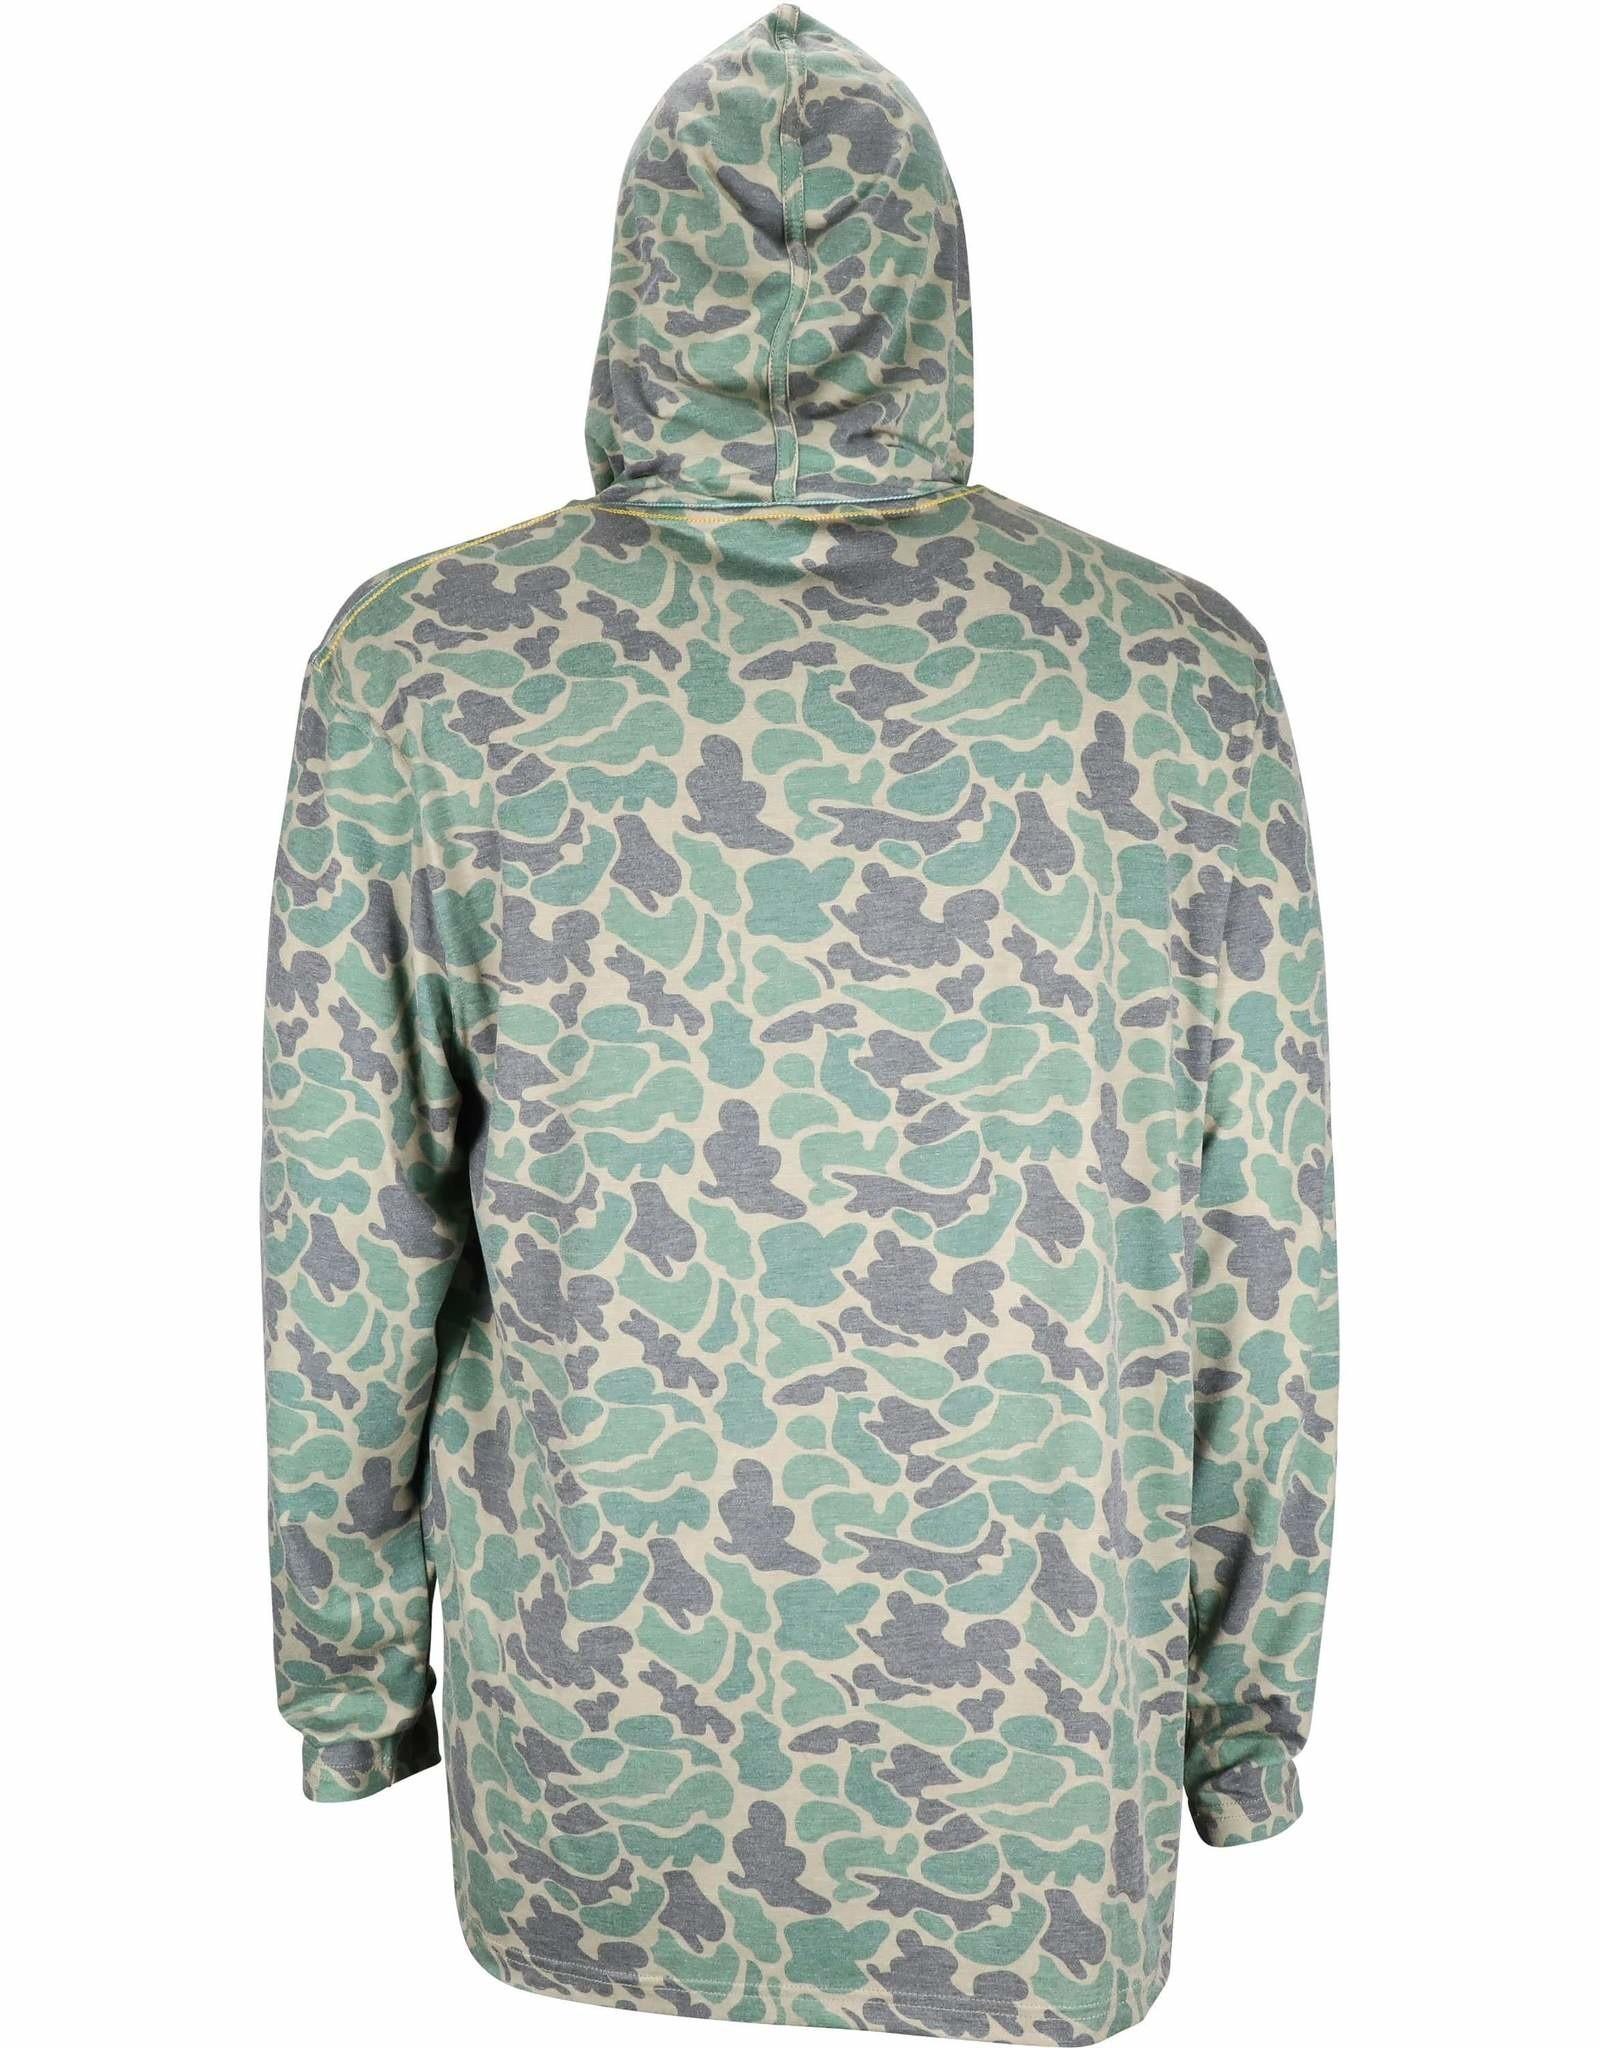 Marsh Wear Mallard Pamlico Hoody